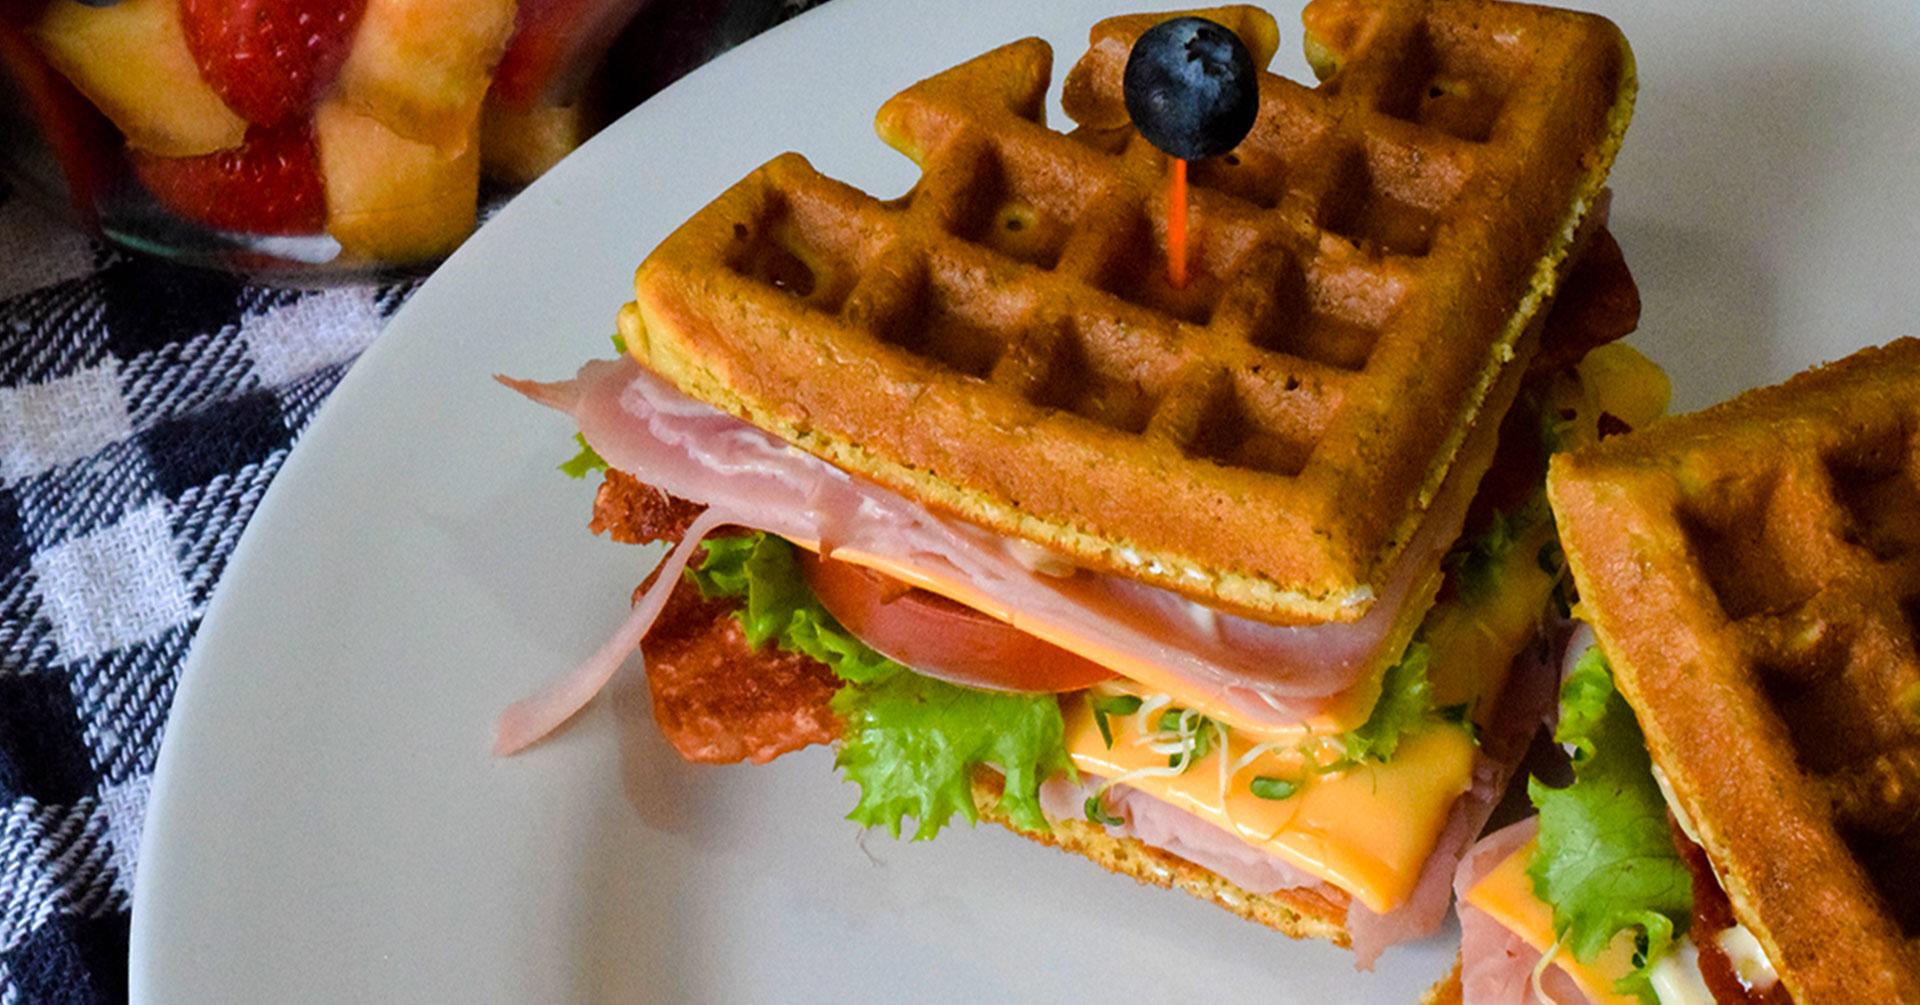 Prepara un sabroso club sándwich wafle